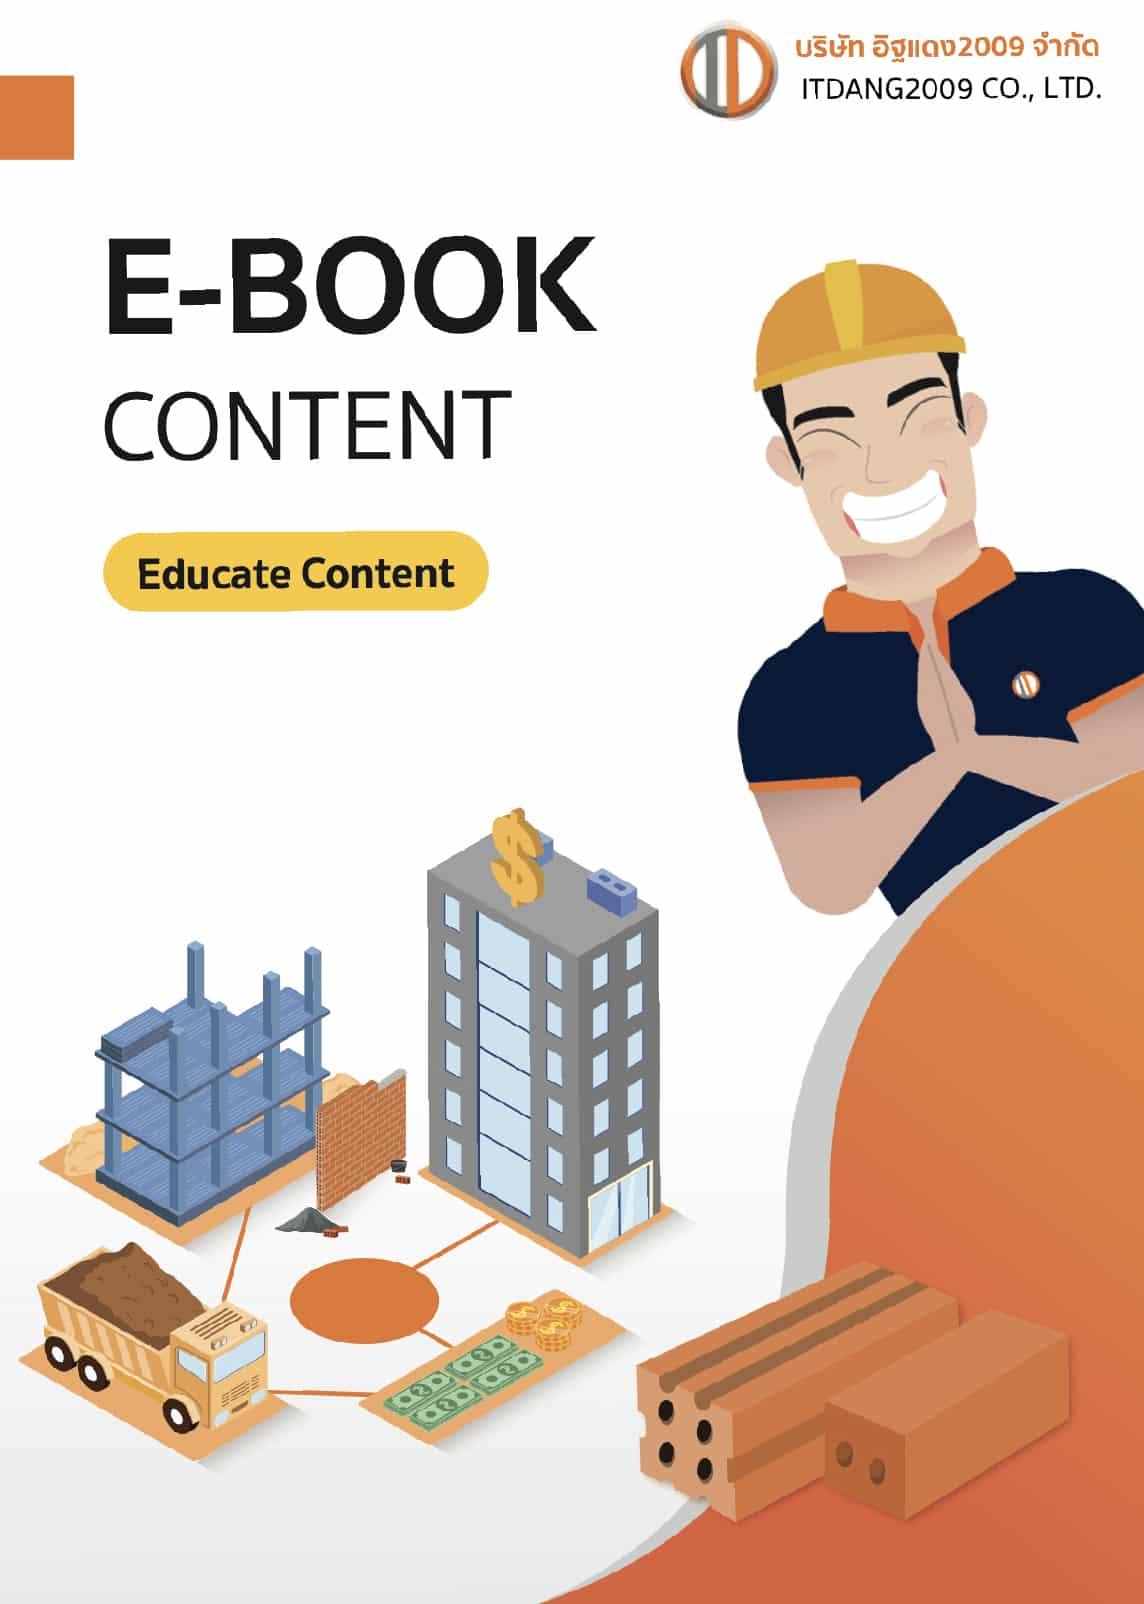 E-BOOK อิฐแดง2009